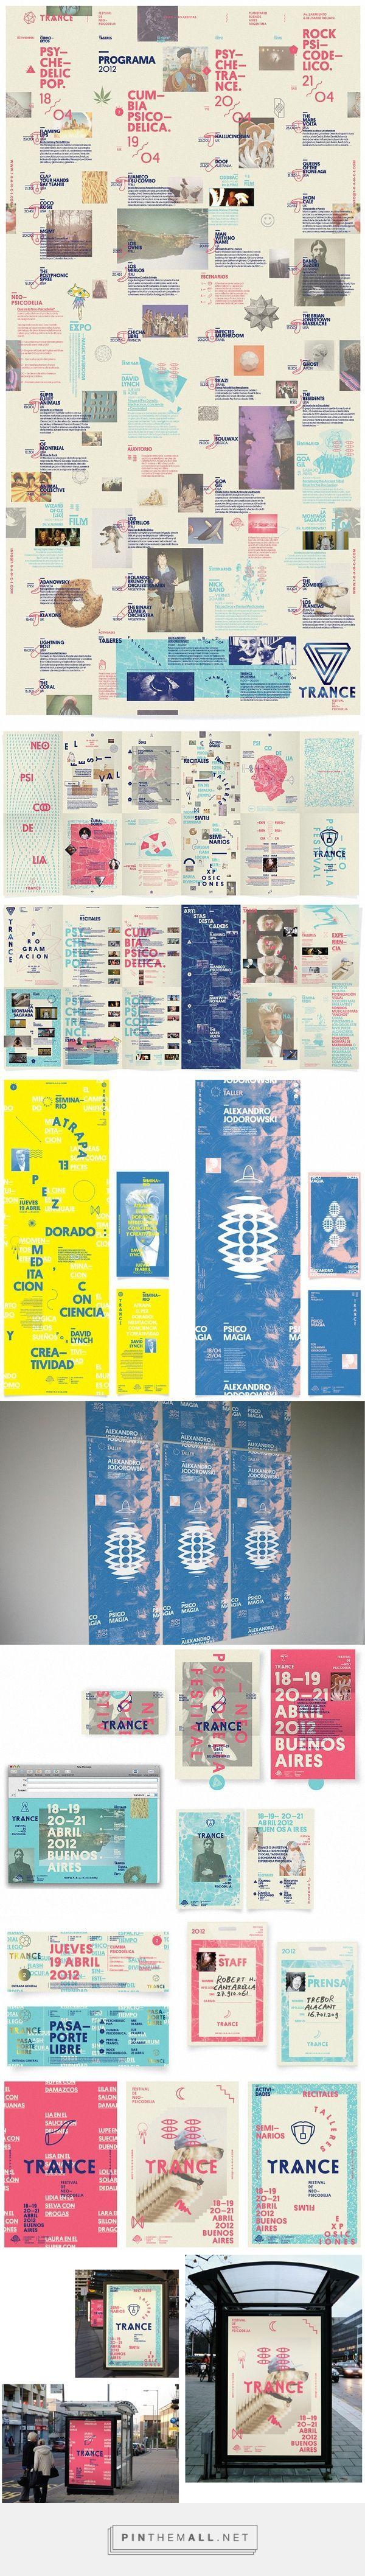 Agustín Guerrero . Contemporary Poster Web Design Brand Identity